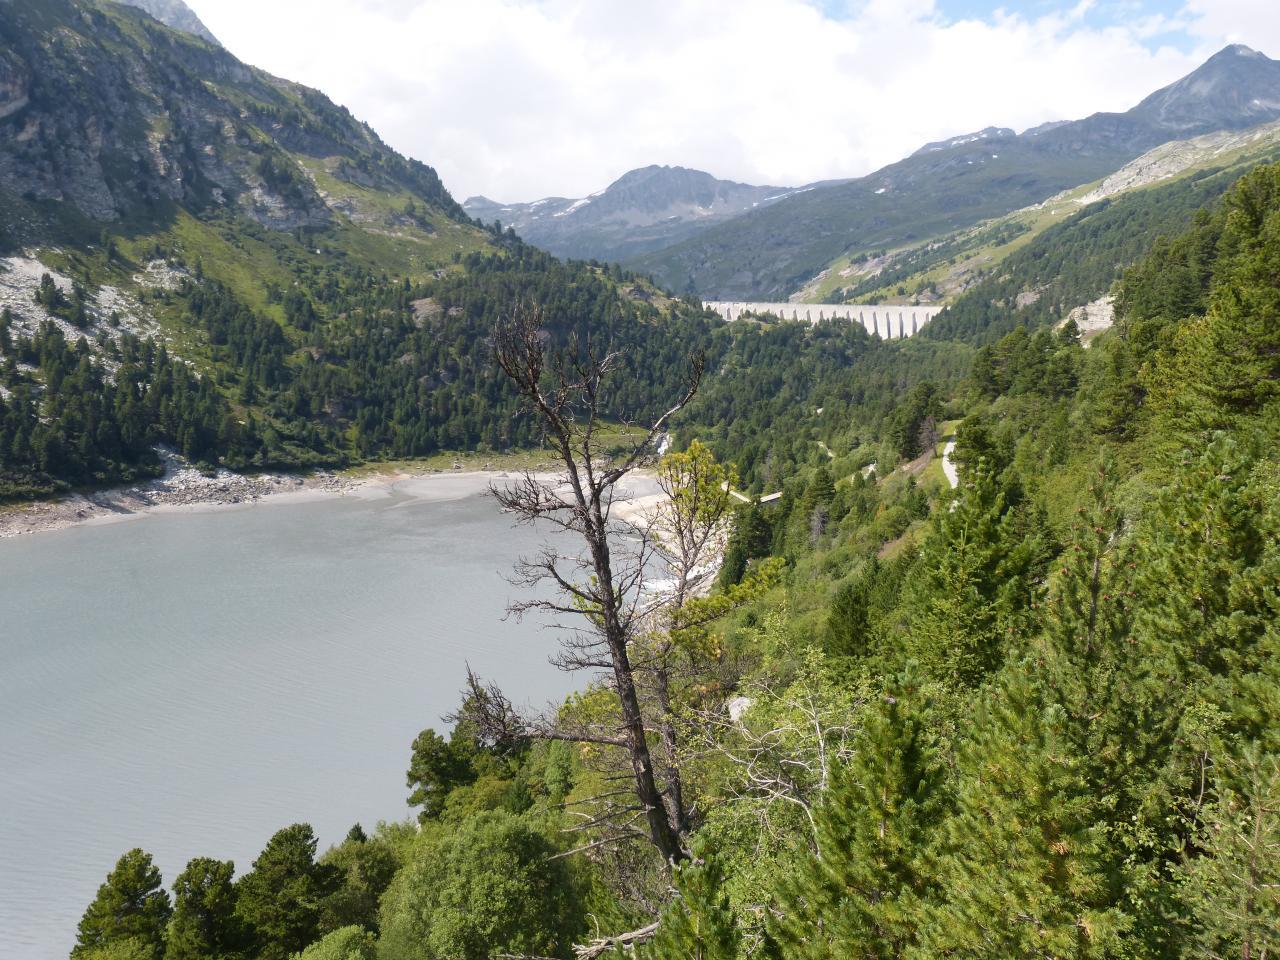 Montée à velo barrage plan d' Aval (Modane)